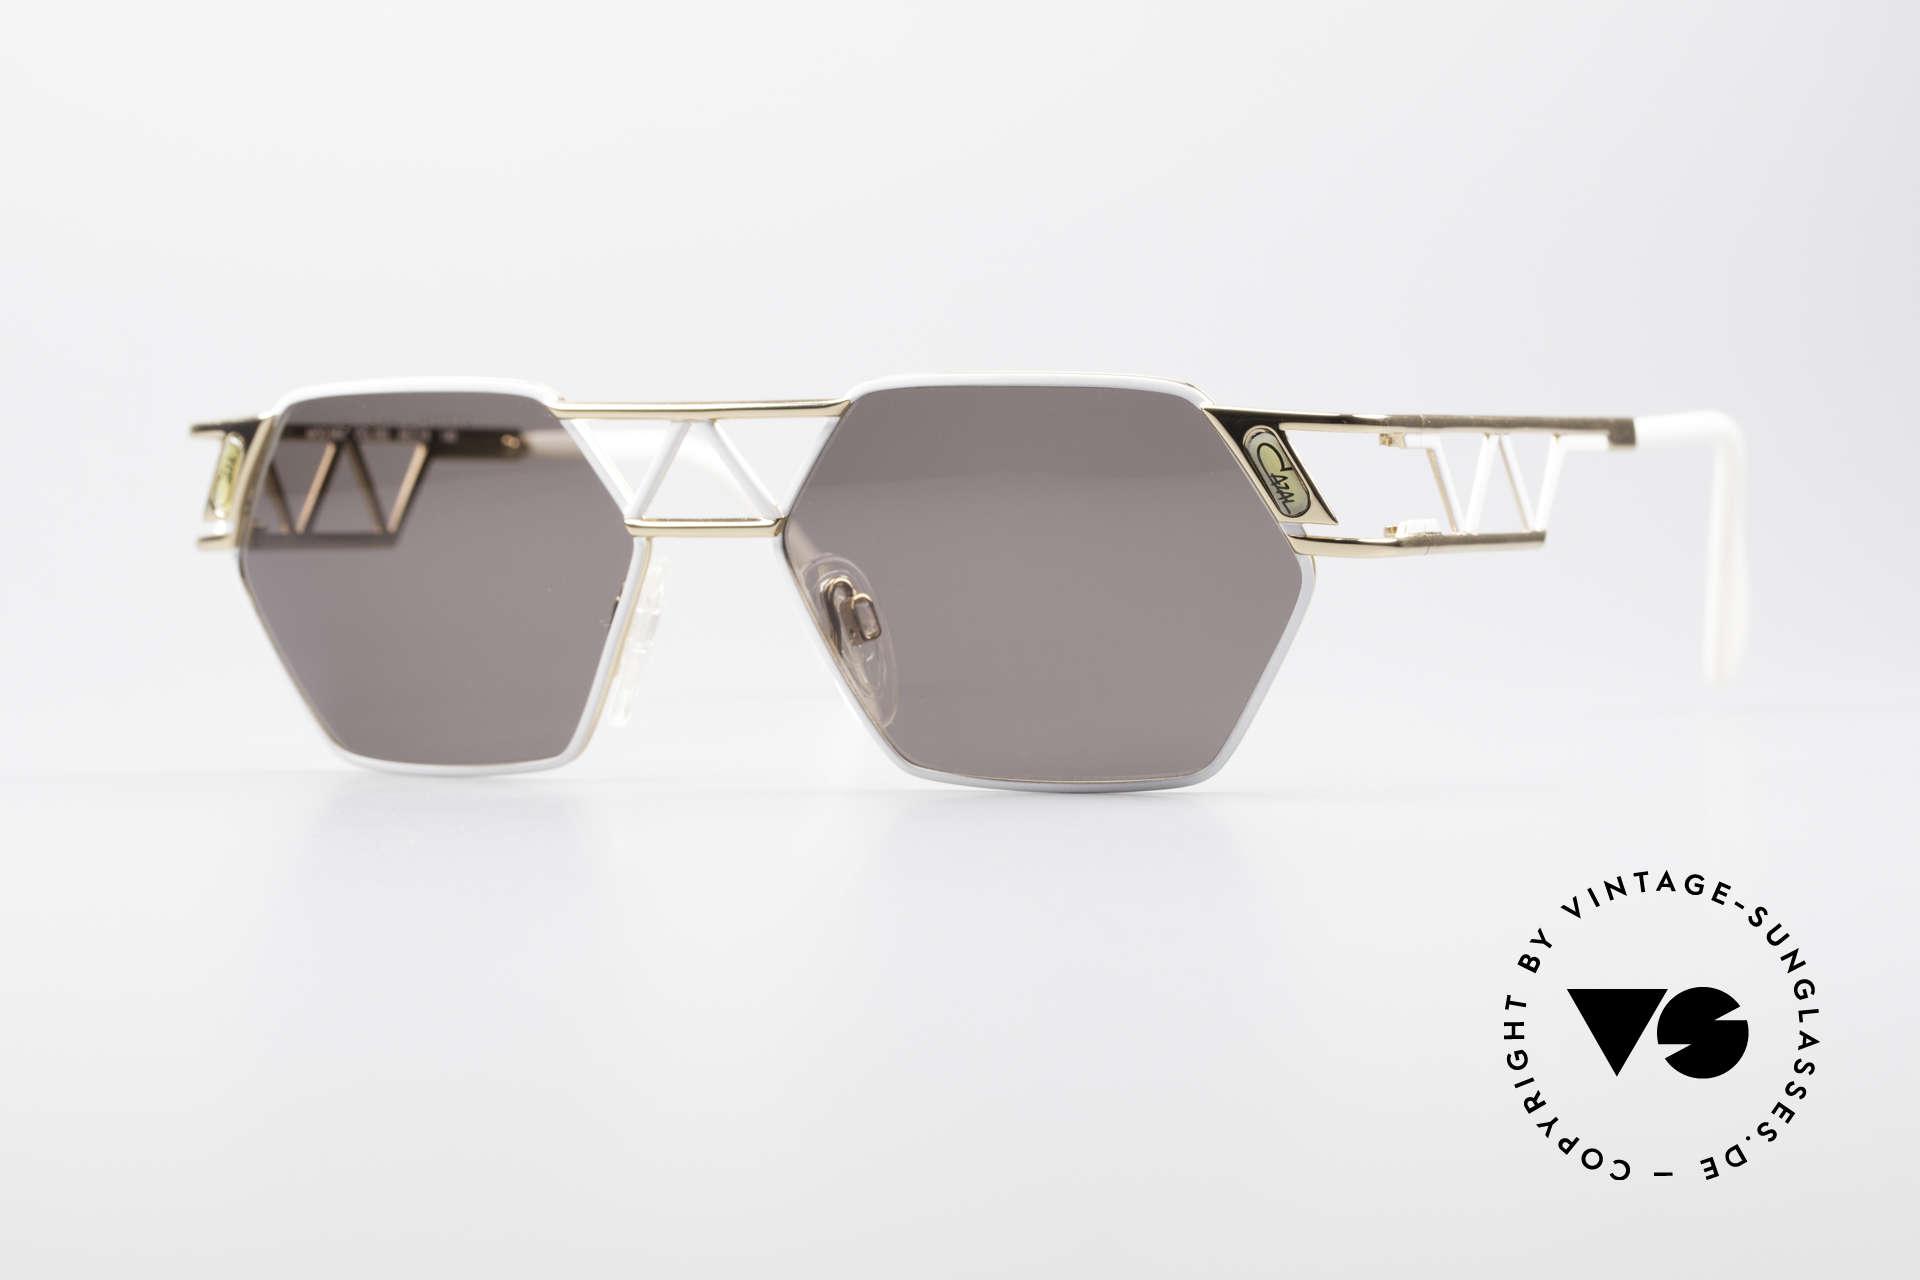 Cazal 960 Rare Designer Sunglasses, angular Cazal designer sunglasses from app. 1994/95, Made for Men and Women